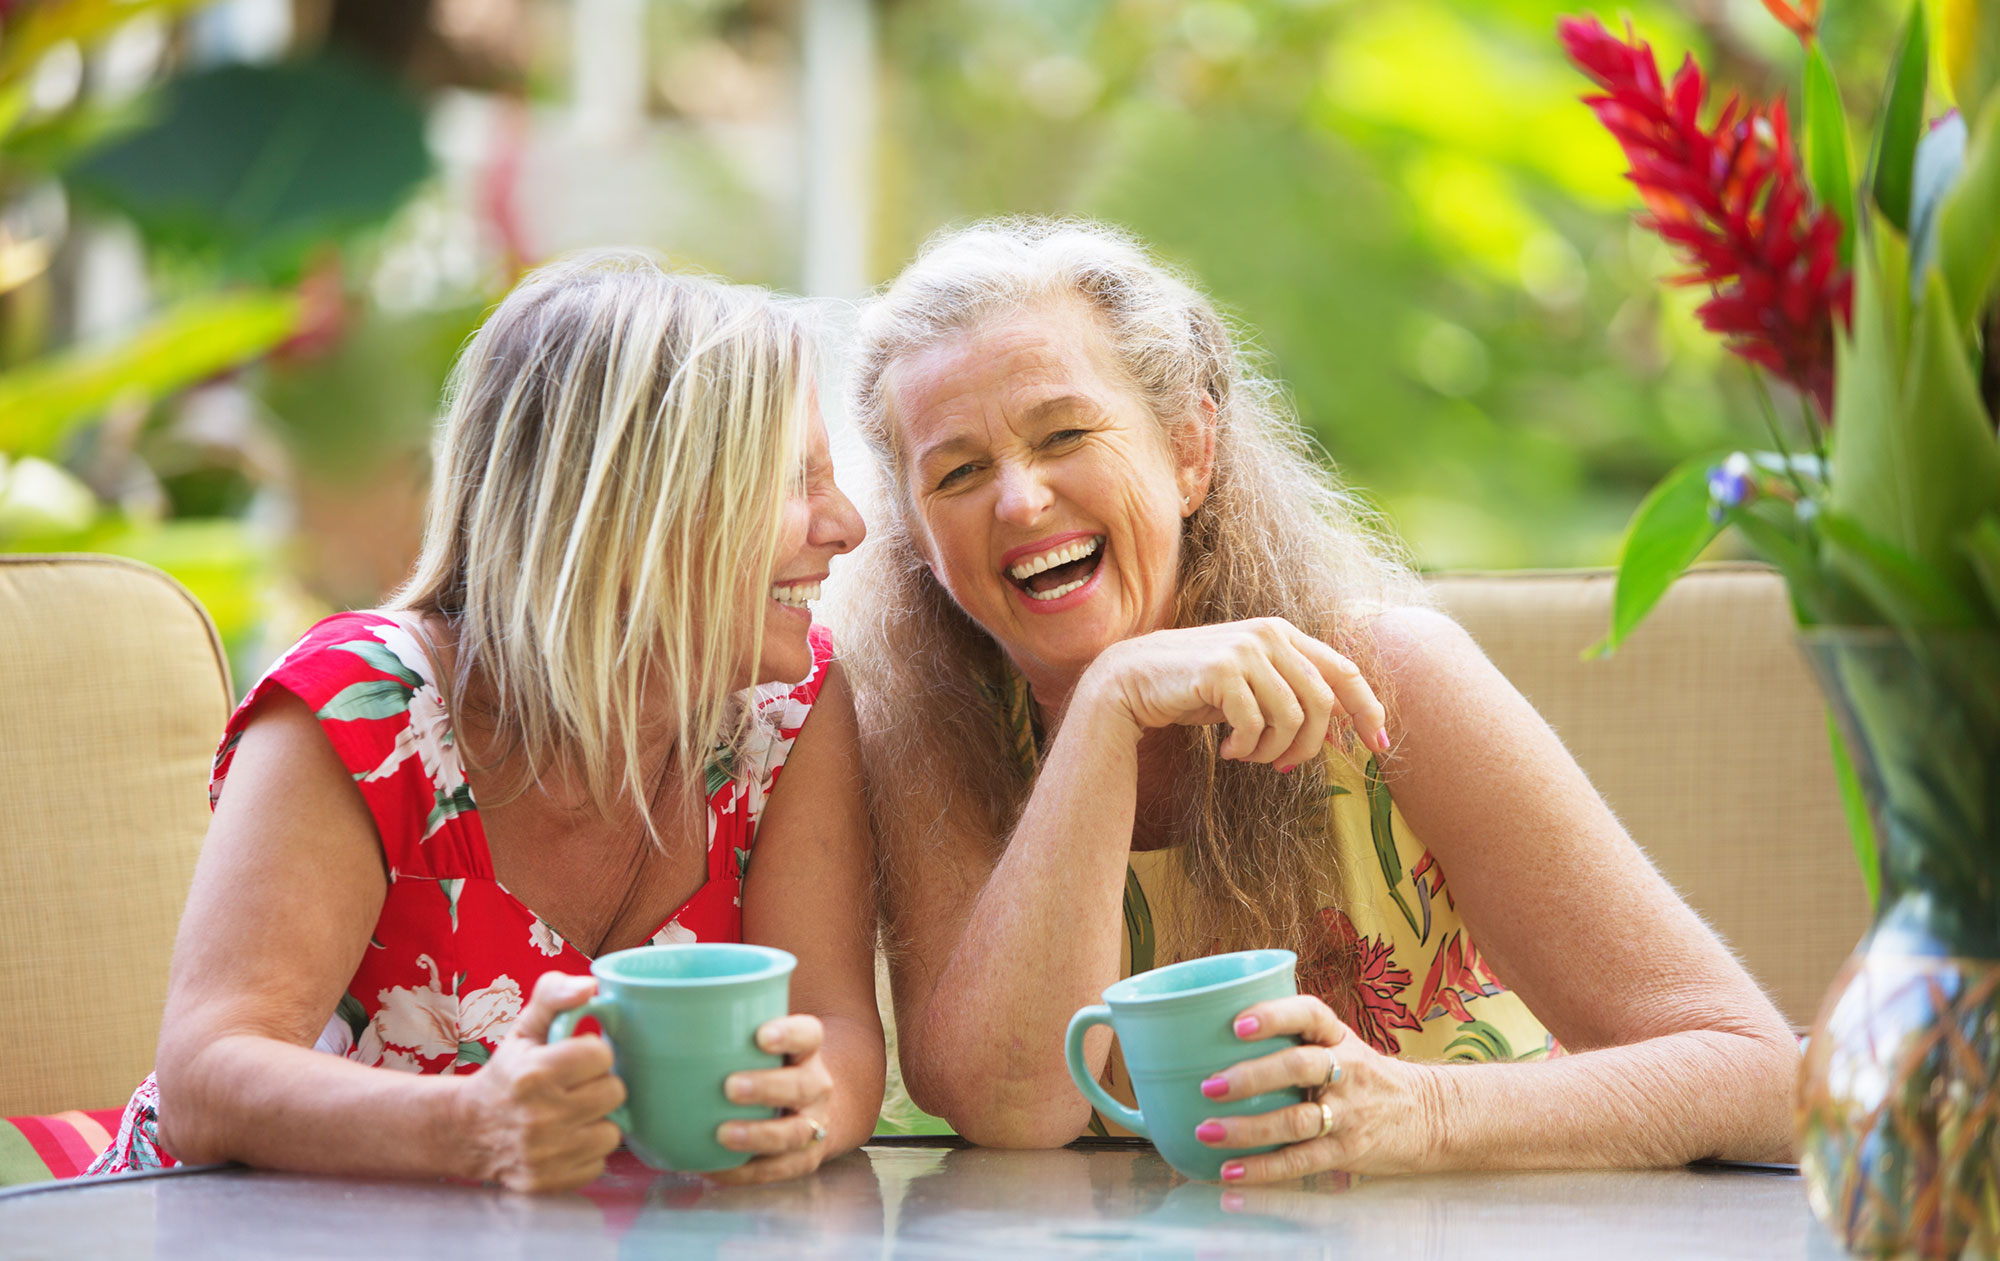 bigstock-Girlfriends-Laughing-96682682-copy.jpg